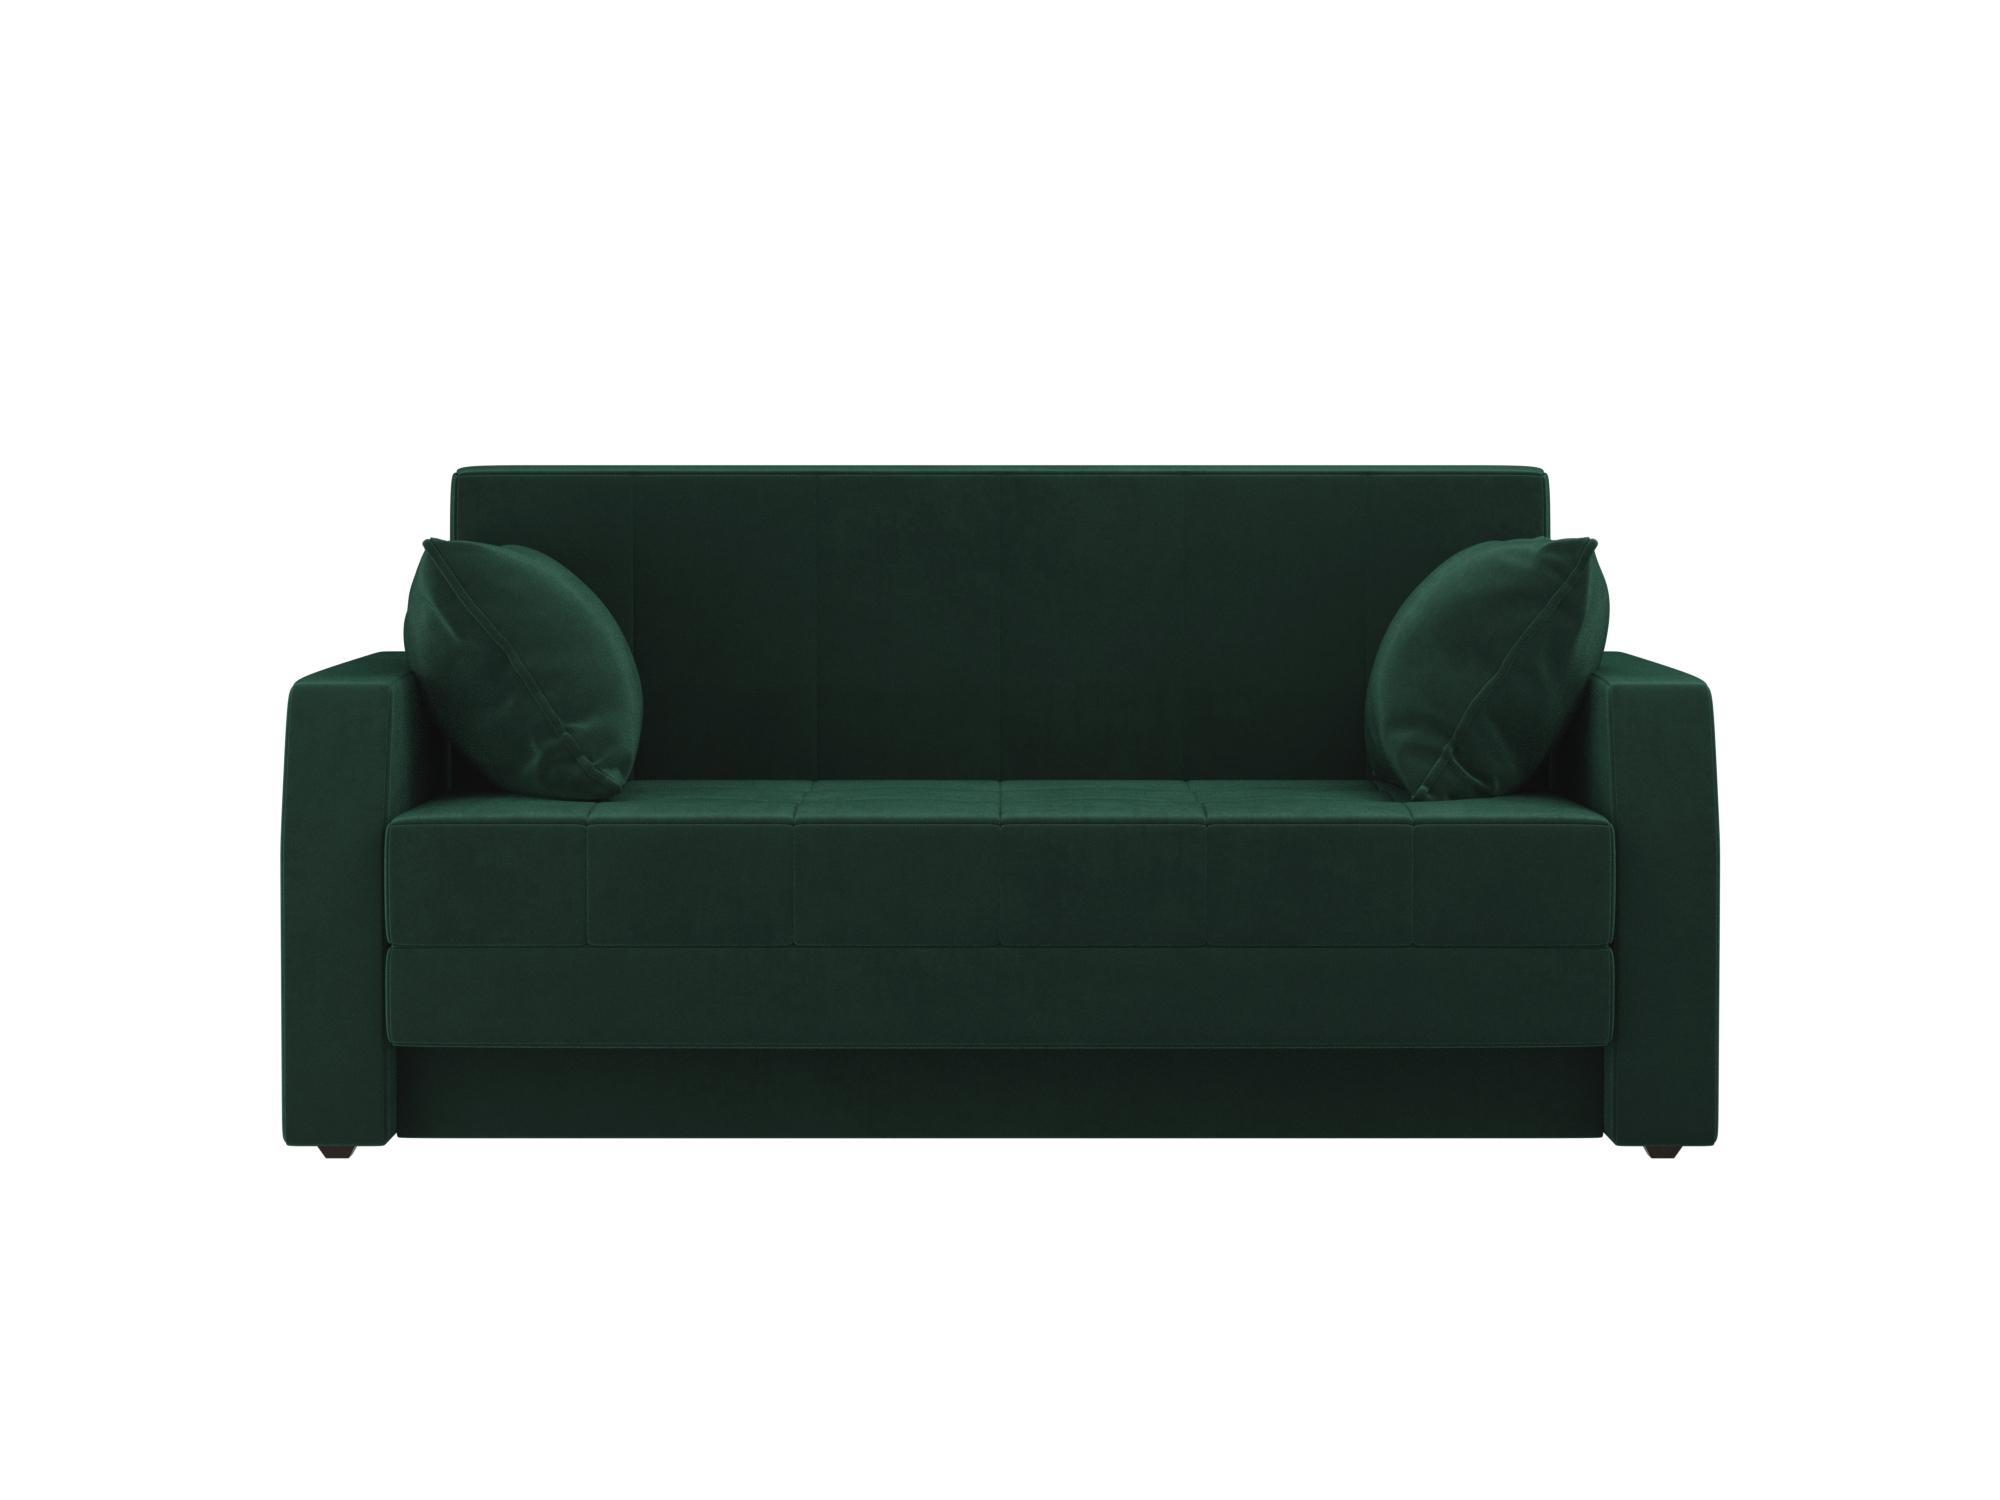 Диван Малютка MebelVia Зеленый